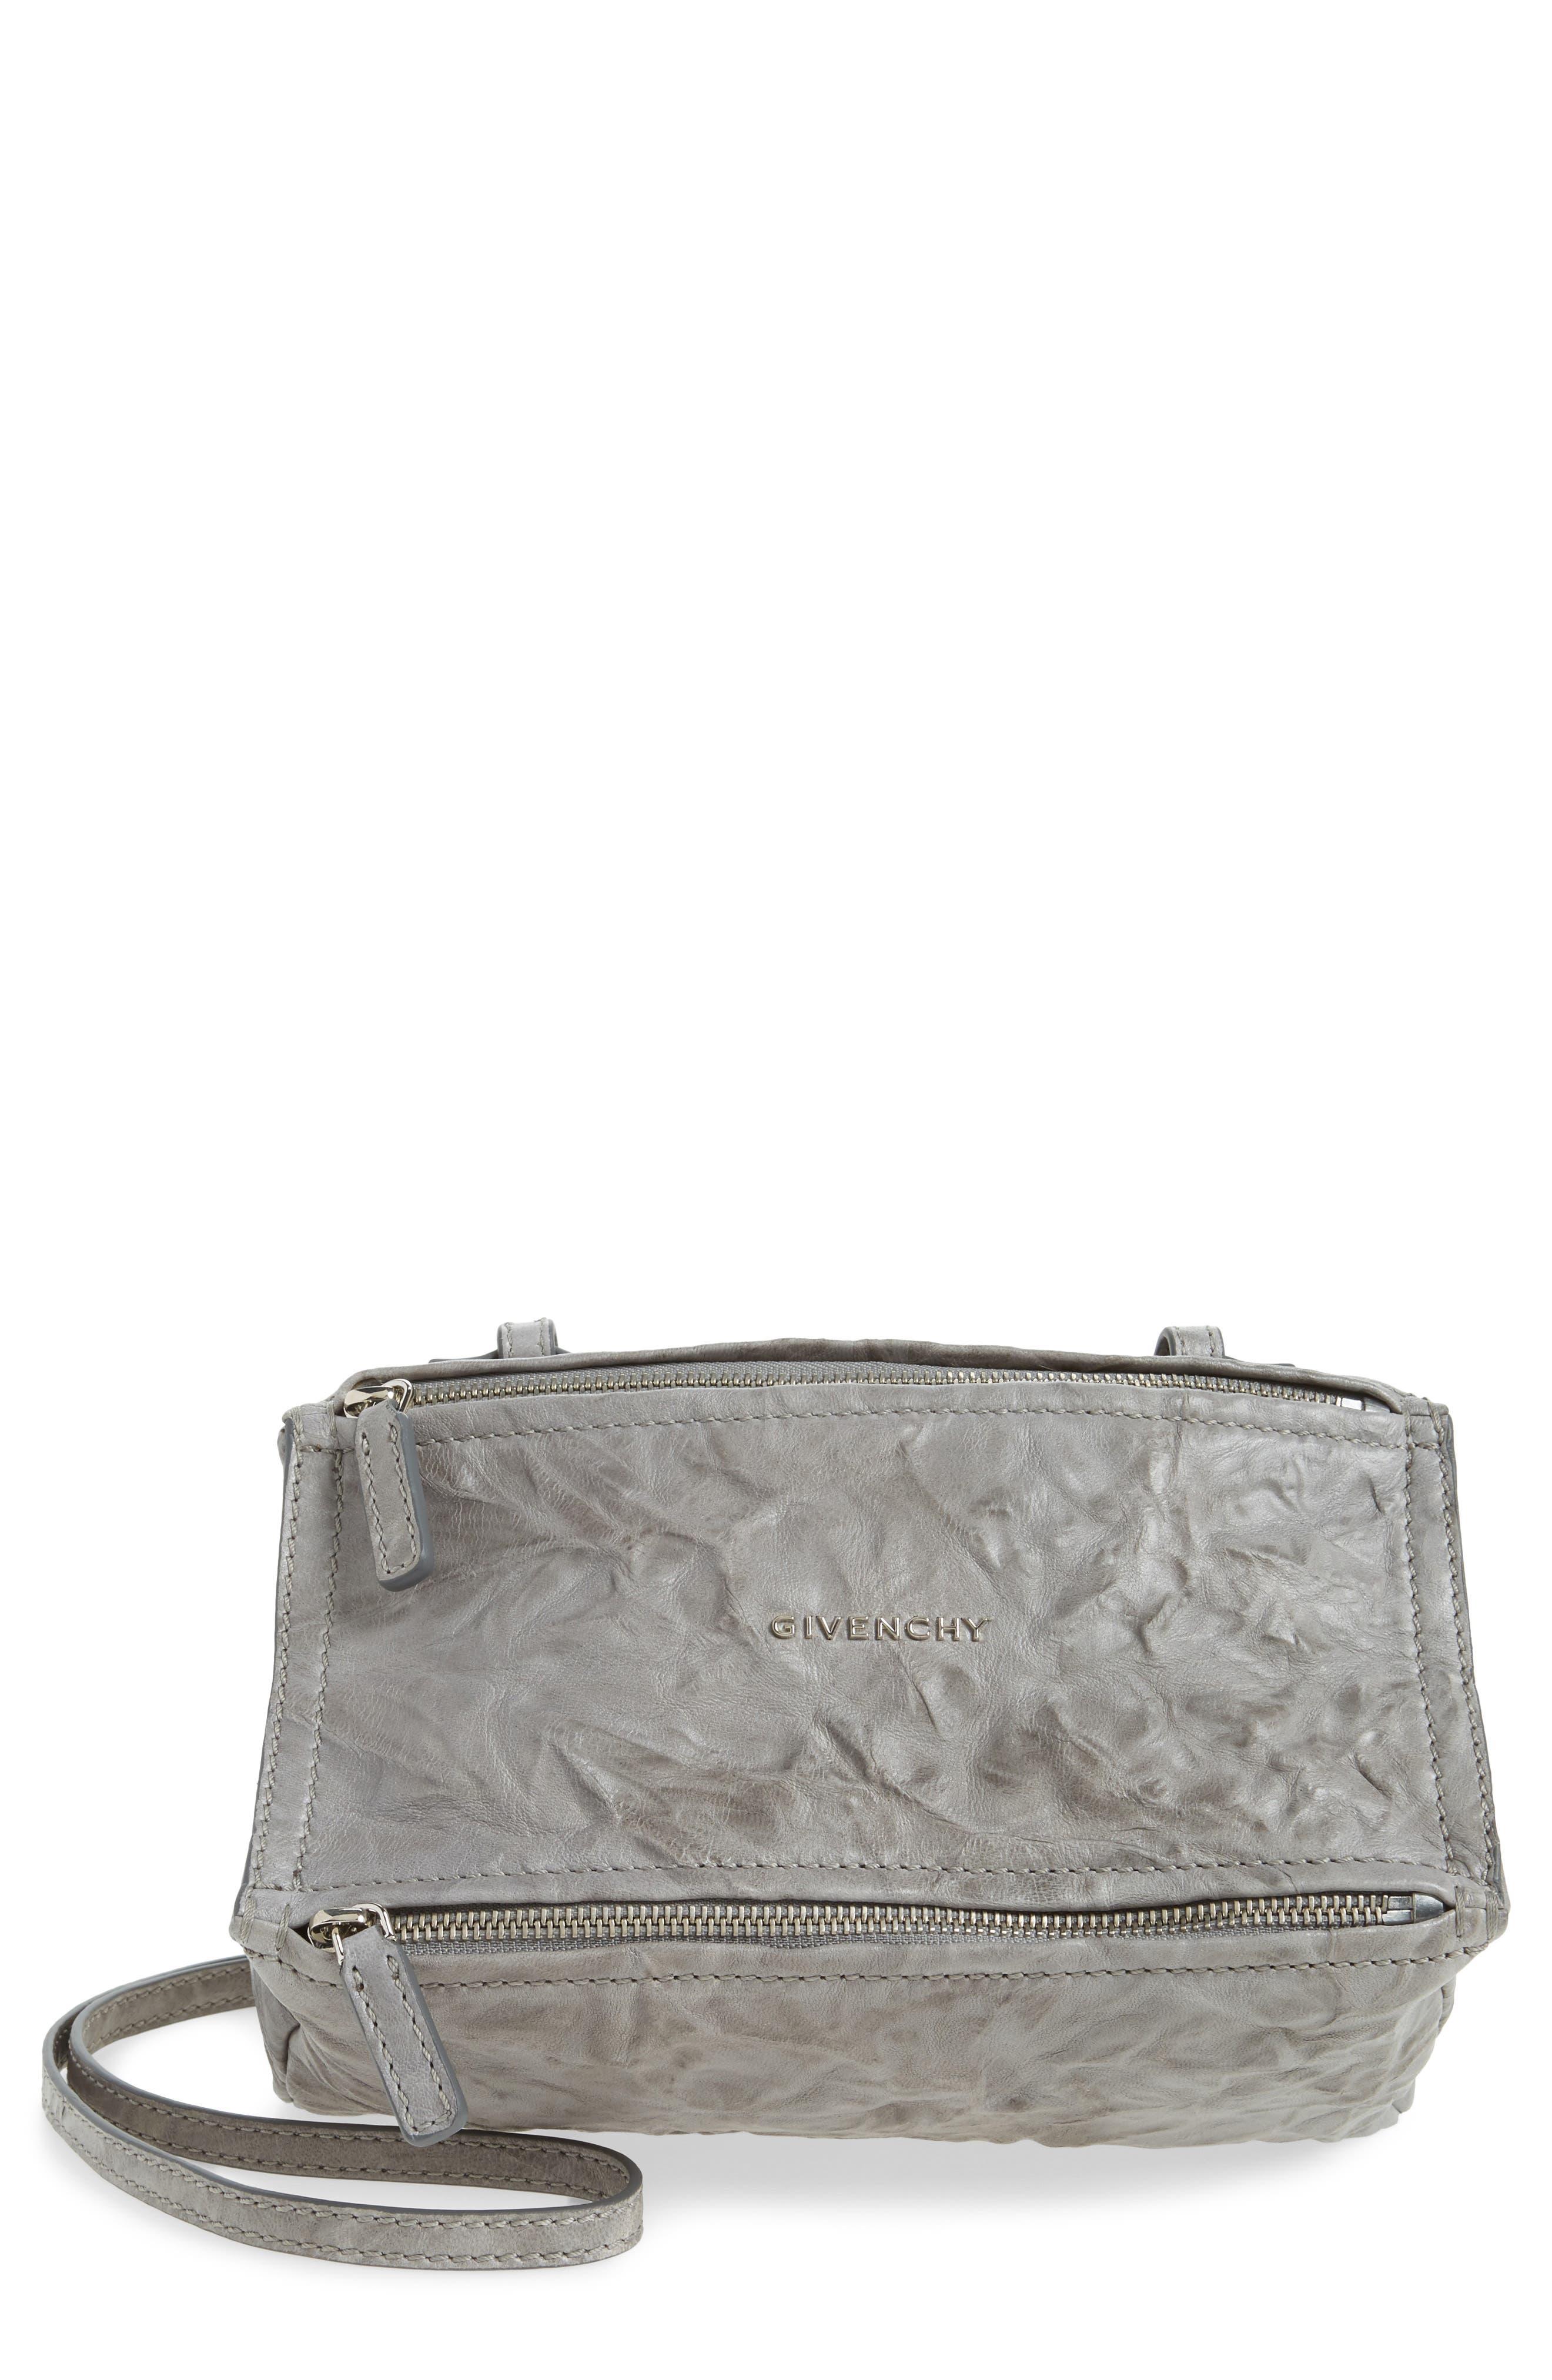 Main Image - Givenchy 'Mini Pepe Pandora' Leather Shoulder Bag